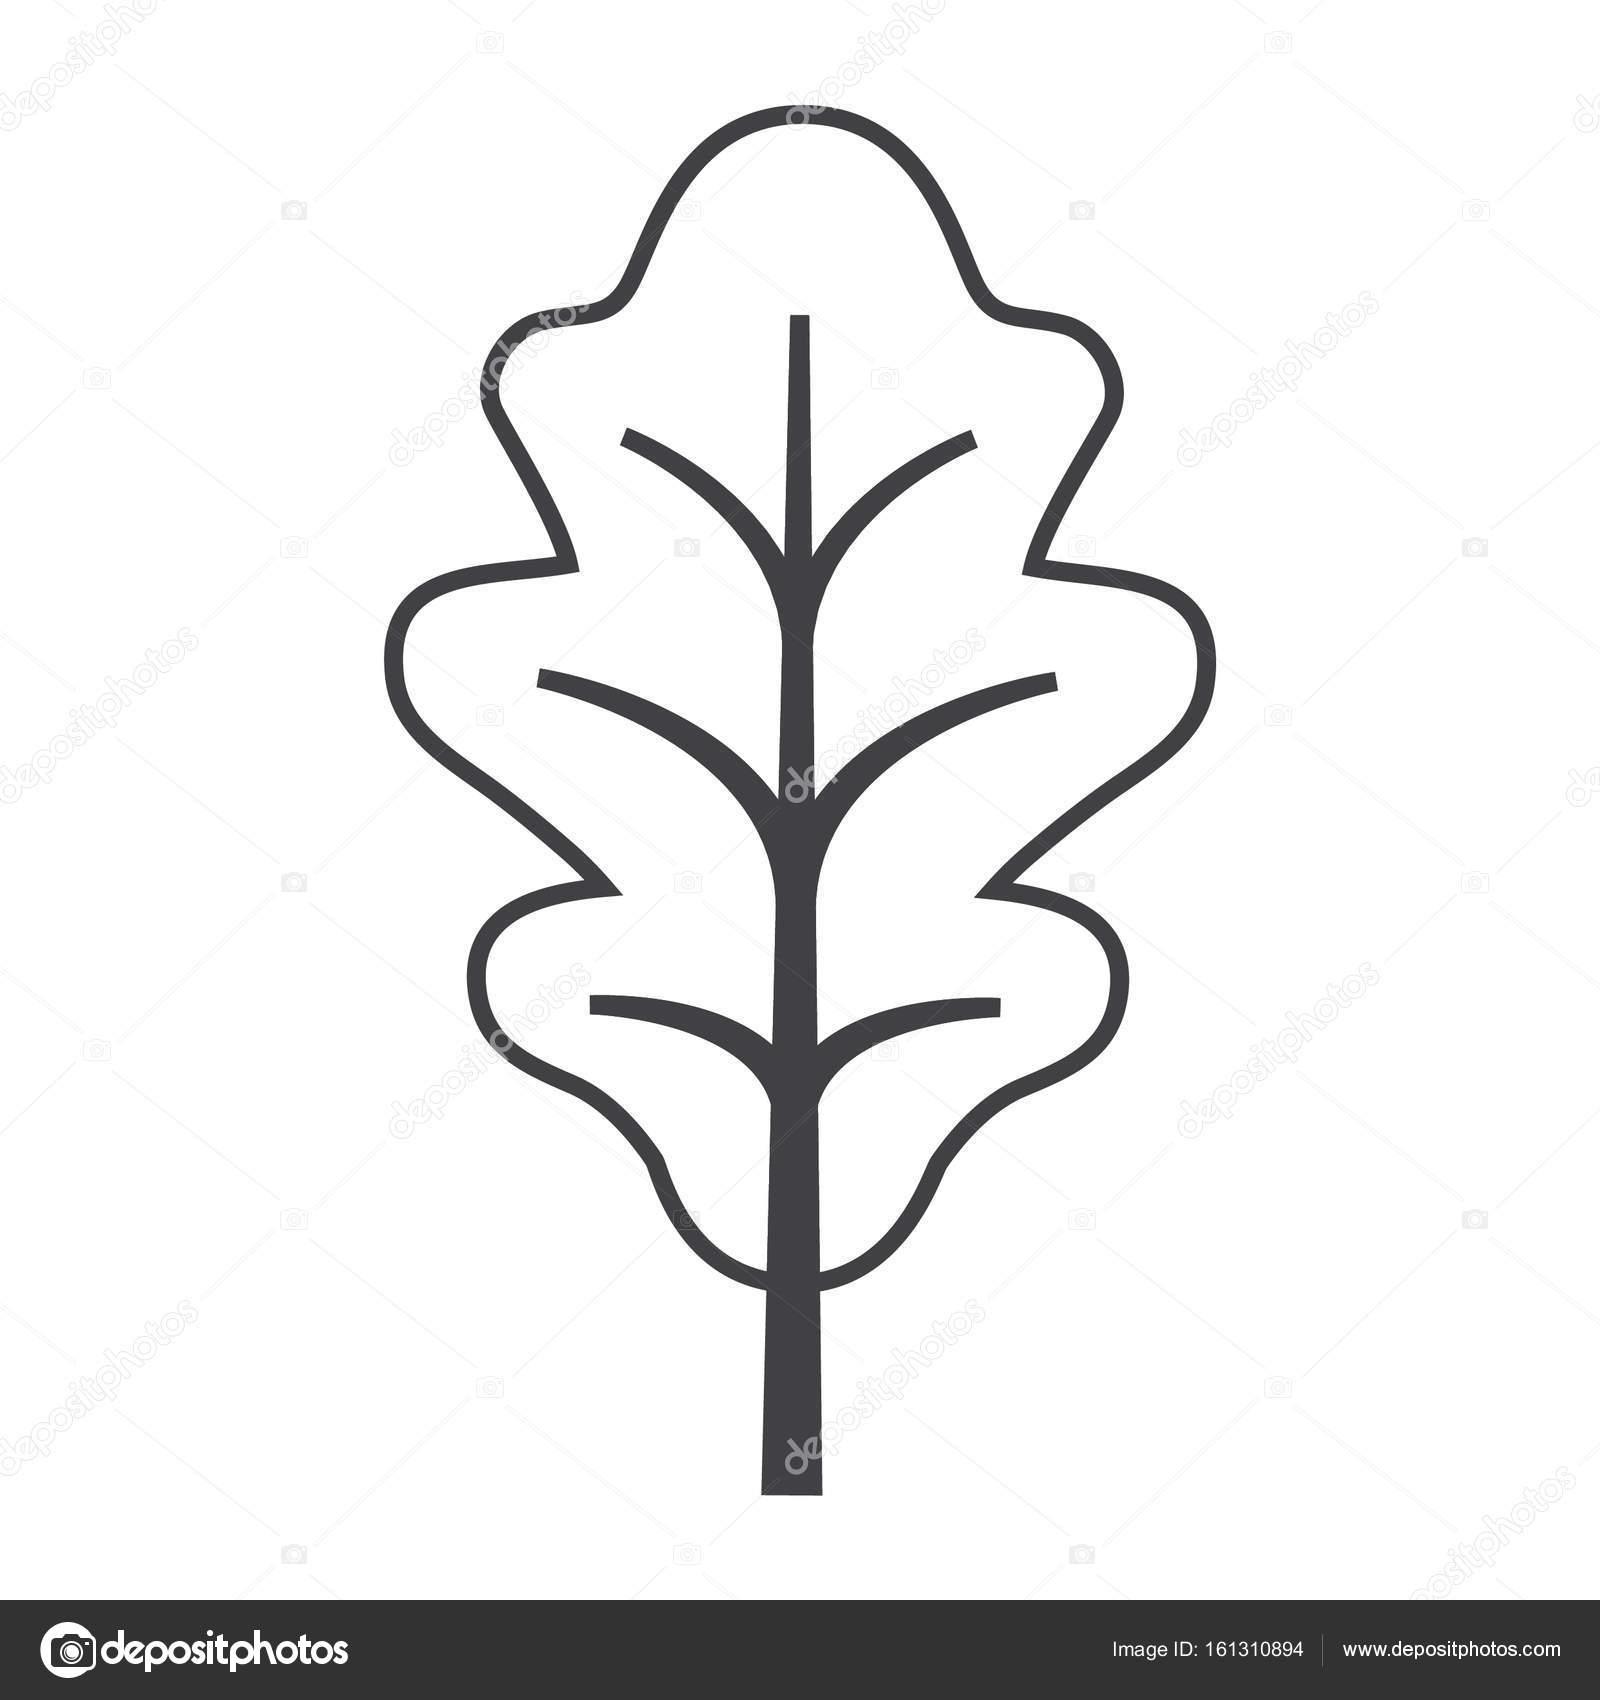 Wyniki Szukania W Grafice Google Dla Https St3 Depositphotos Com 3146911 16131 V 1600 Depositphotos 161310894 Stock Illustration Thin Line Oak Leaf Icon Santa